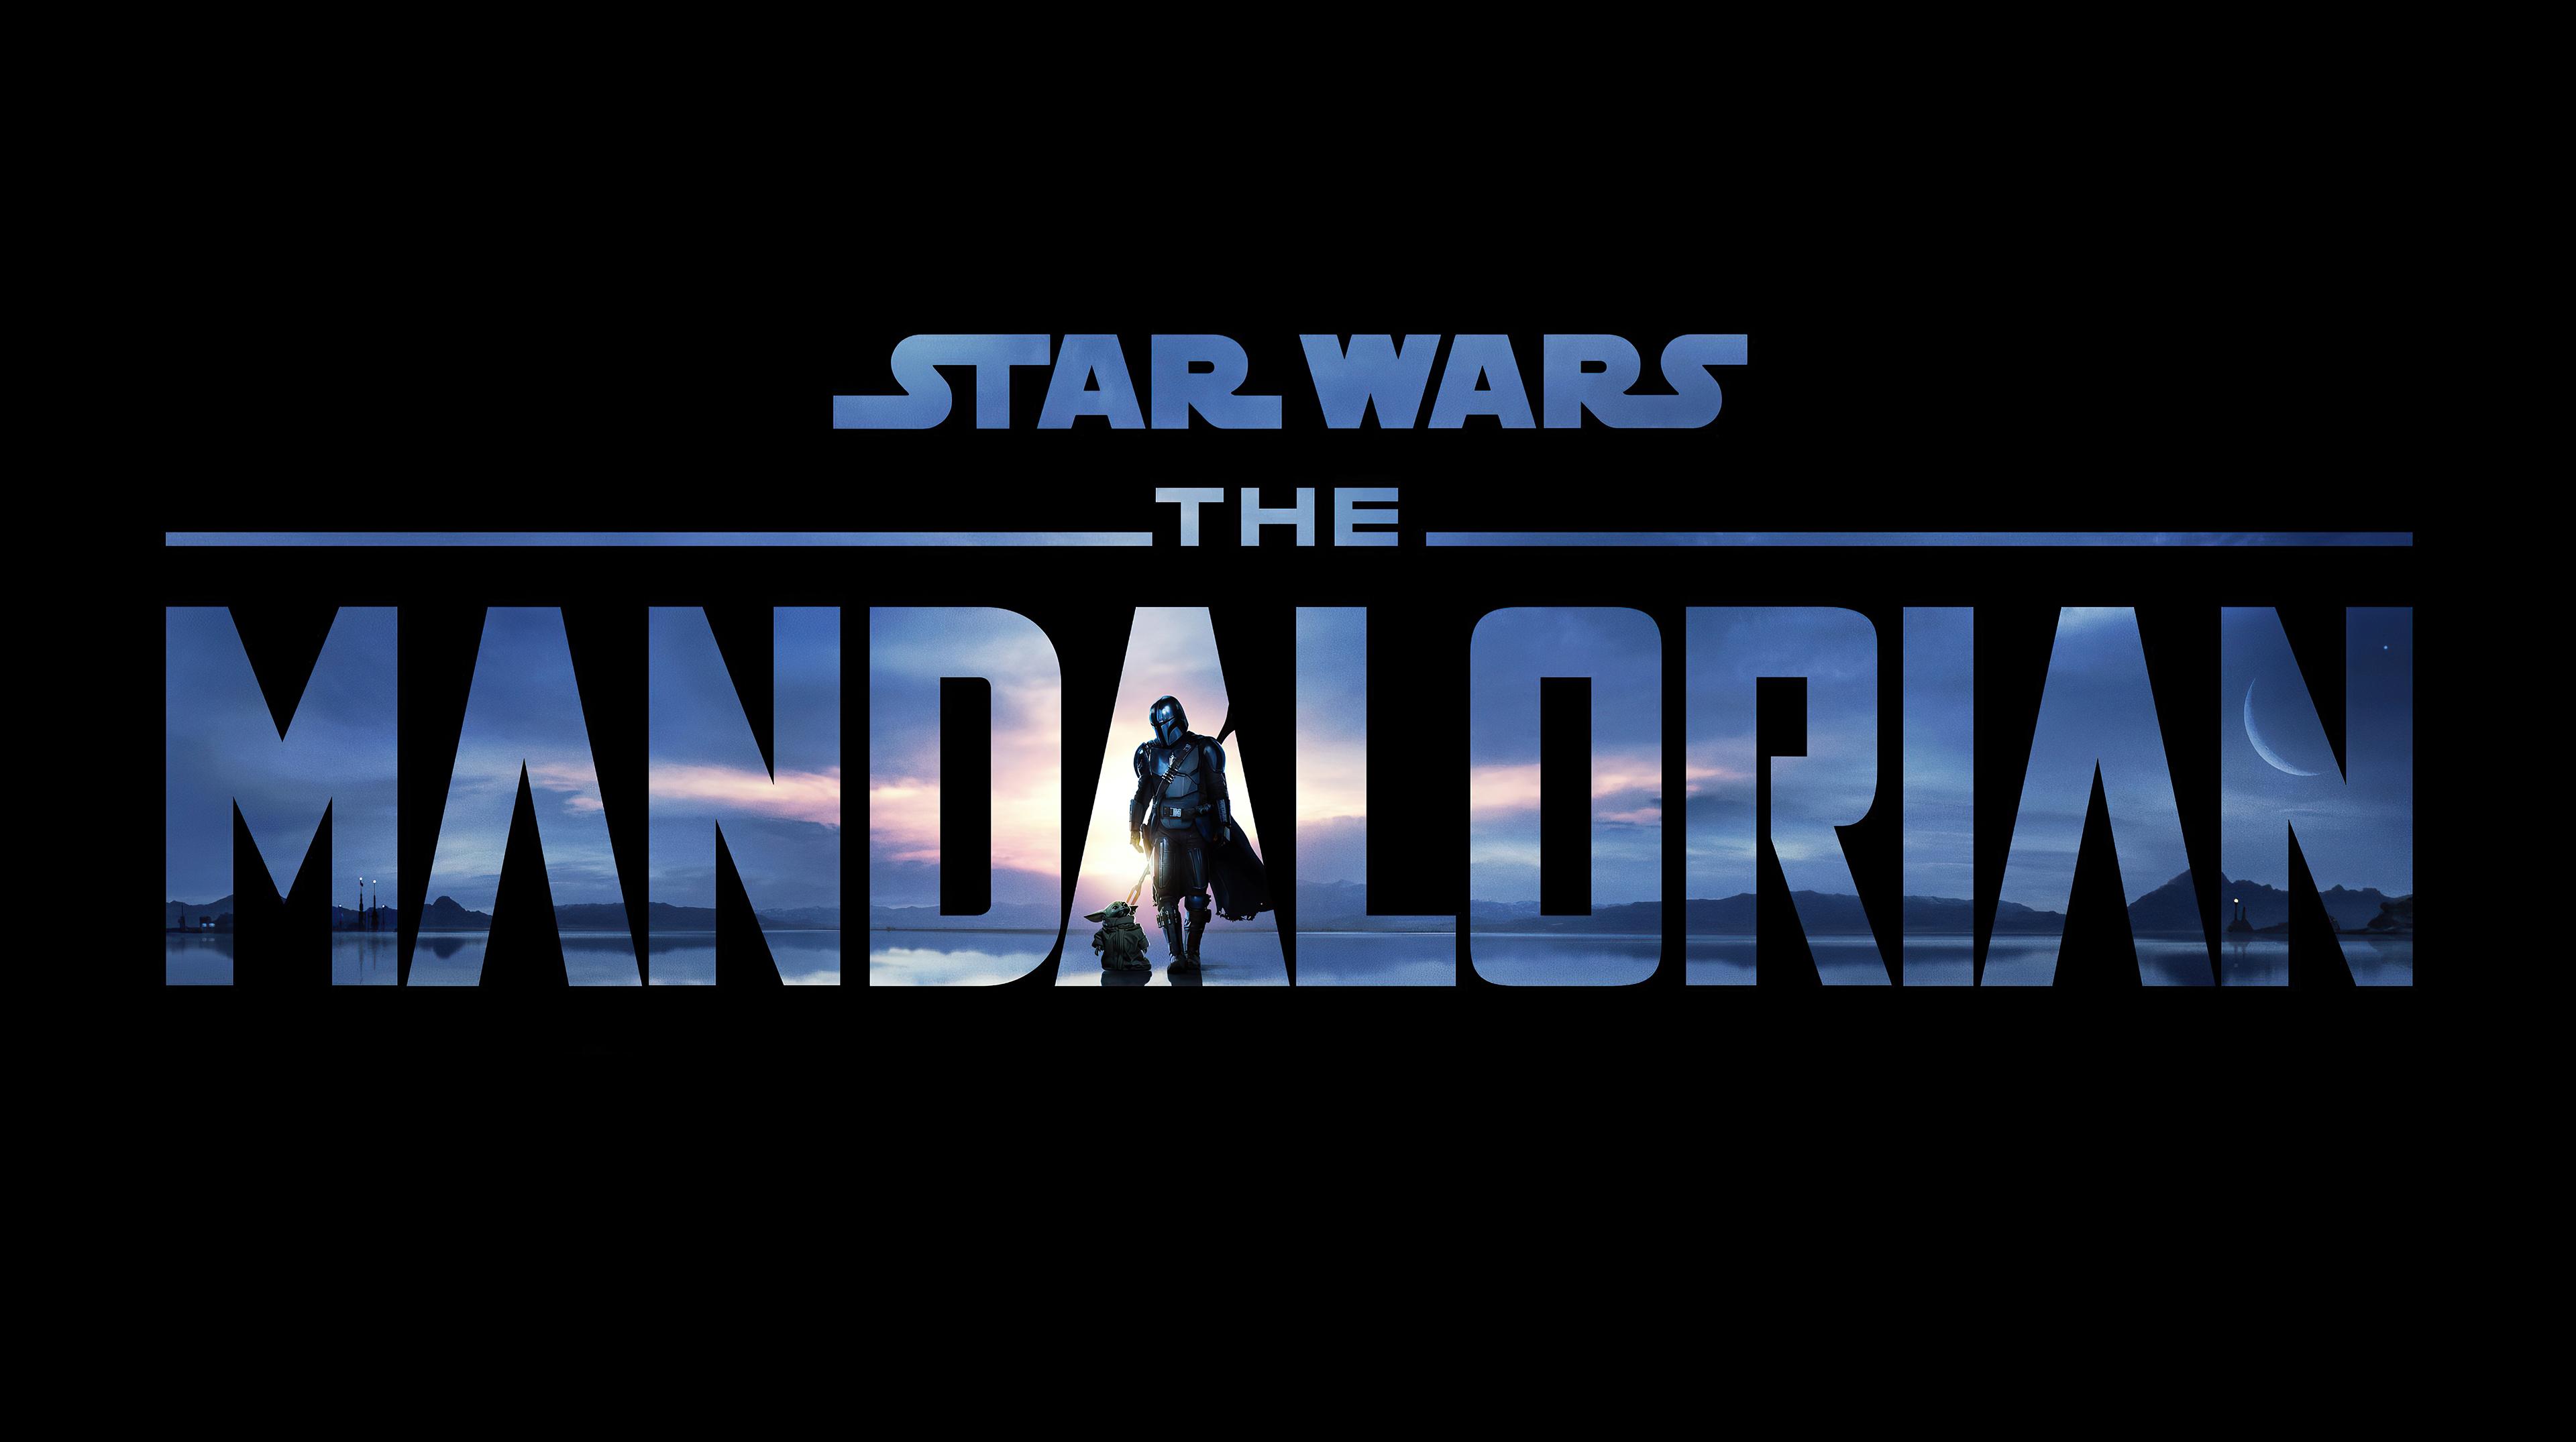 Wallpaper 4k Star Wars The Mandalorian Official 4k Star Wars The Mandalorian Official 4k Wallpapers